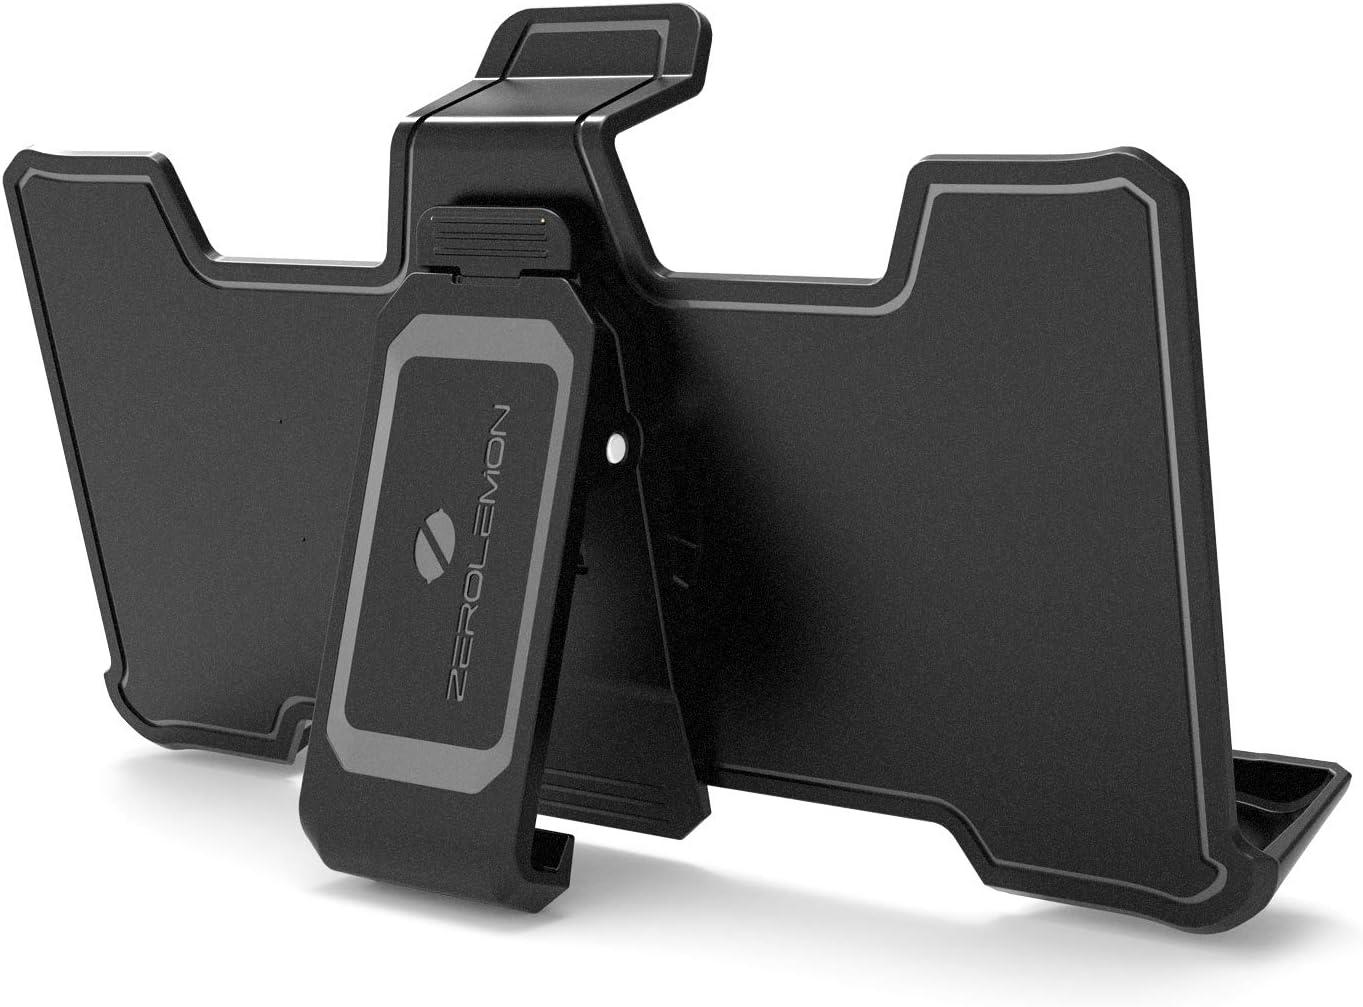 Belt Clip Holster for ZeroLemon Galaxy Note 10 Plus 10000mAh ZeroShock Battery Case Battery Case is NOT Included